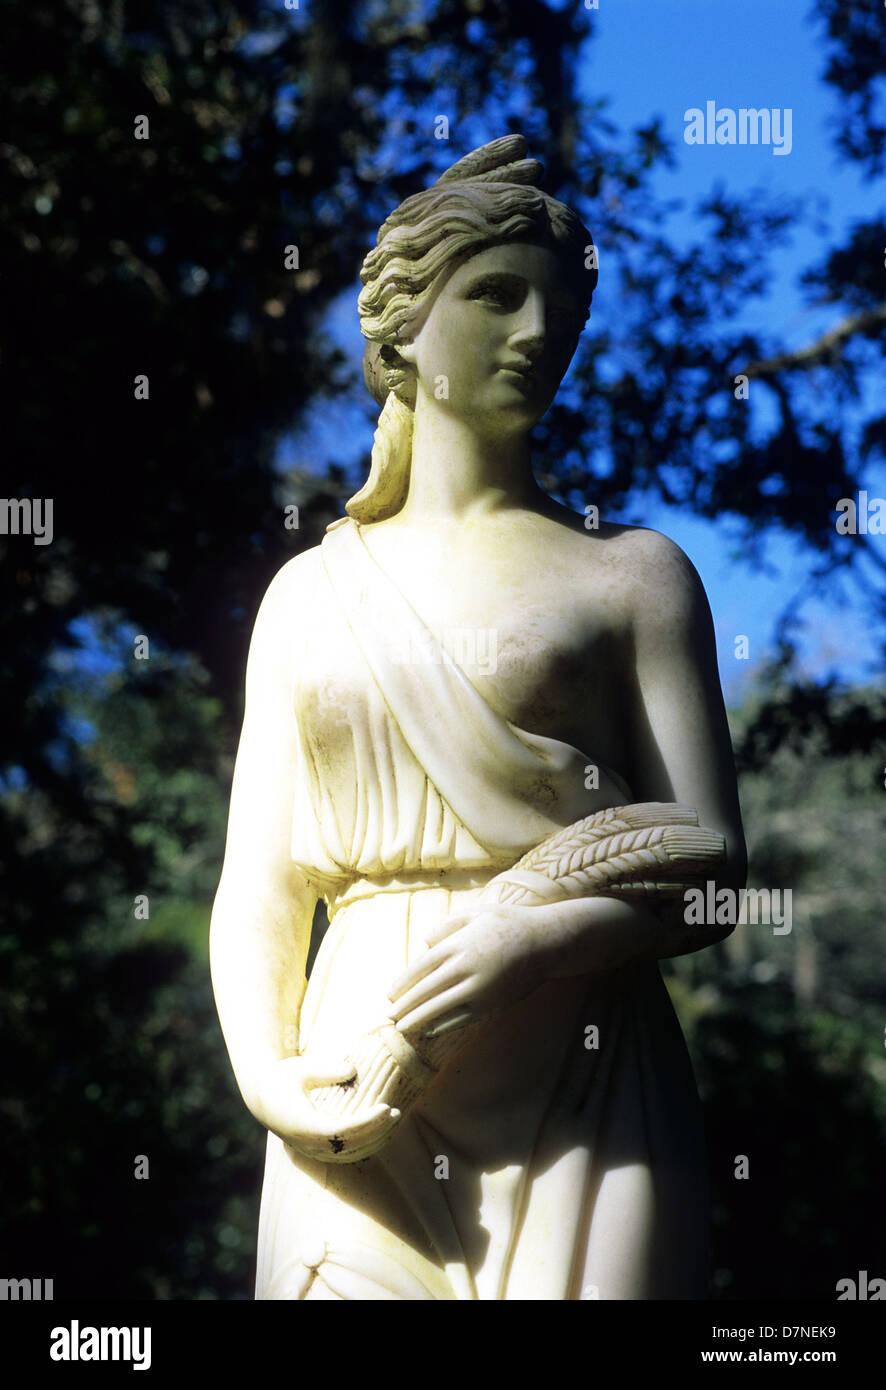 Elk283-3044v Louisiana, St Francisville, Rosedown Plantation State Historic Site, Mansion, 1836, garden statue - Stock Image